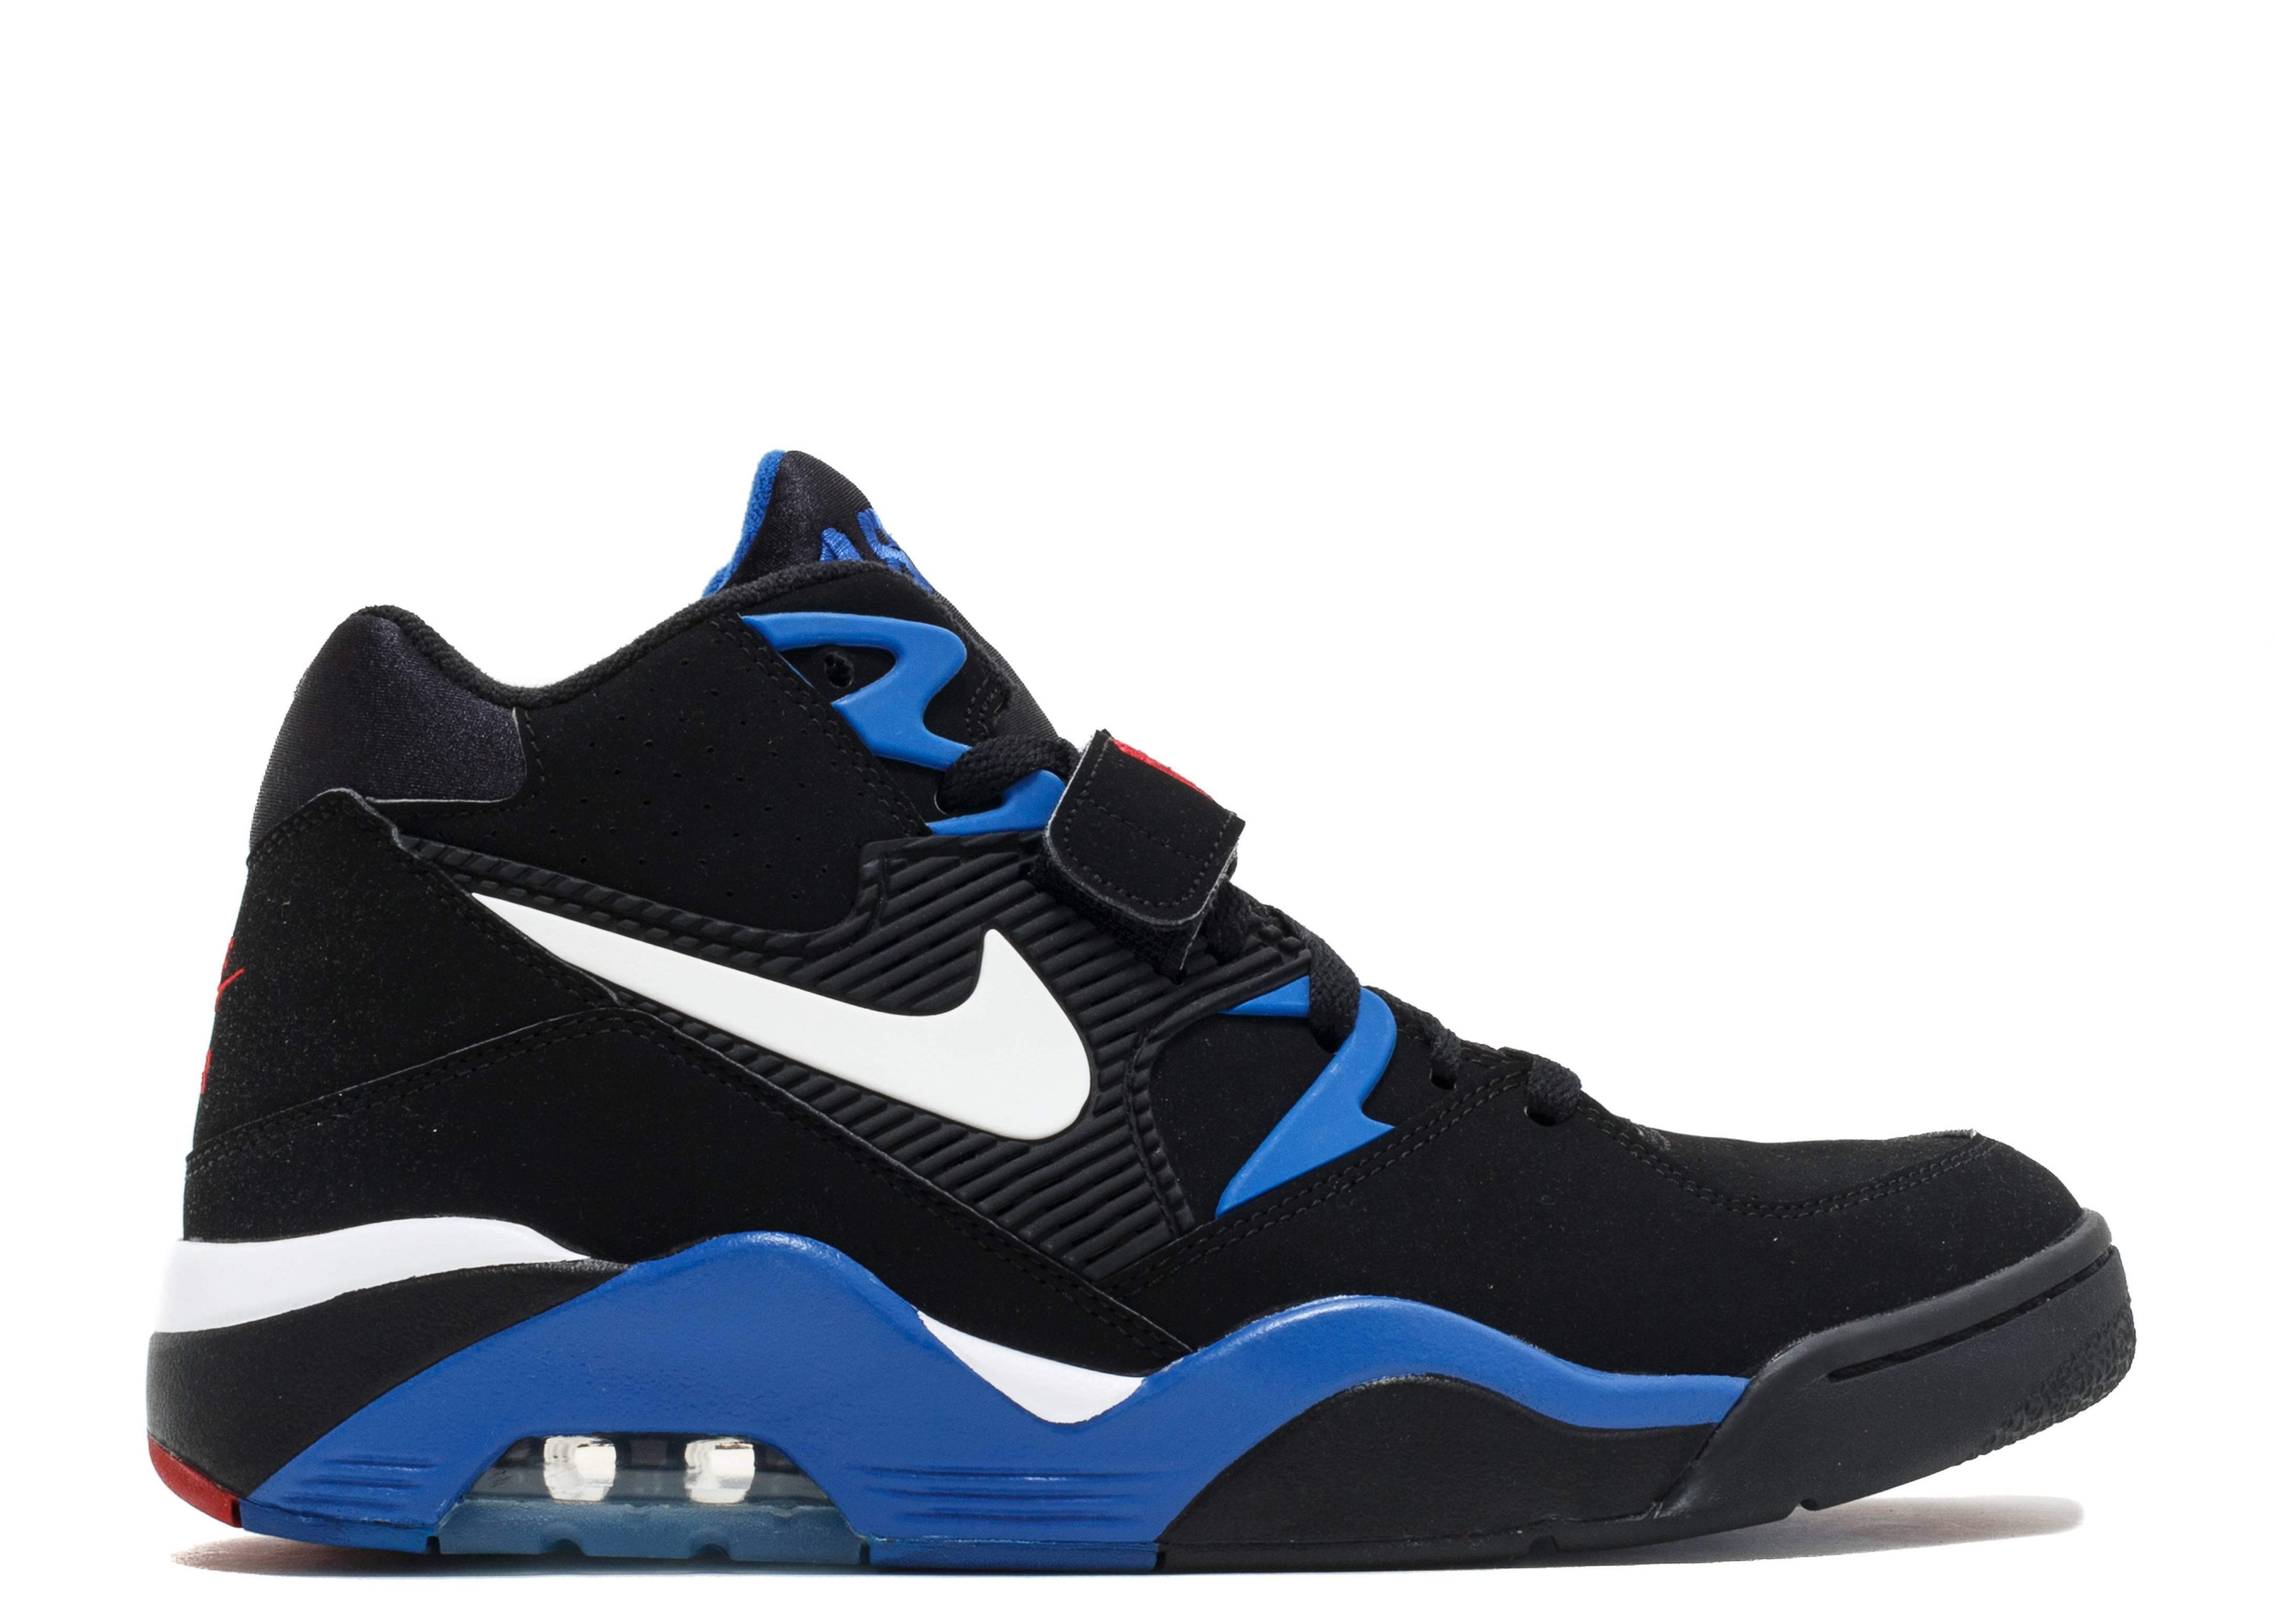 758c426ccc Air Force 180 - Nike - 310095 011 - blk/wht-sport royal-vrsty red | Flight  Club